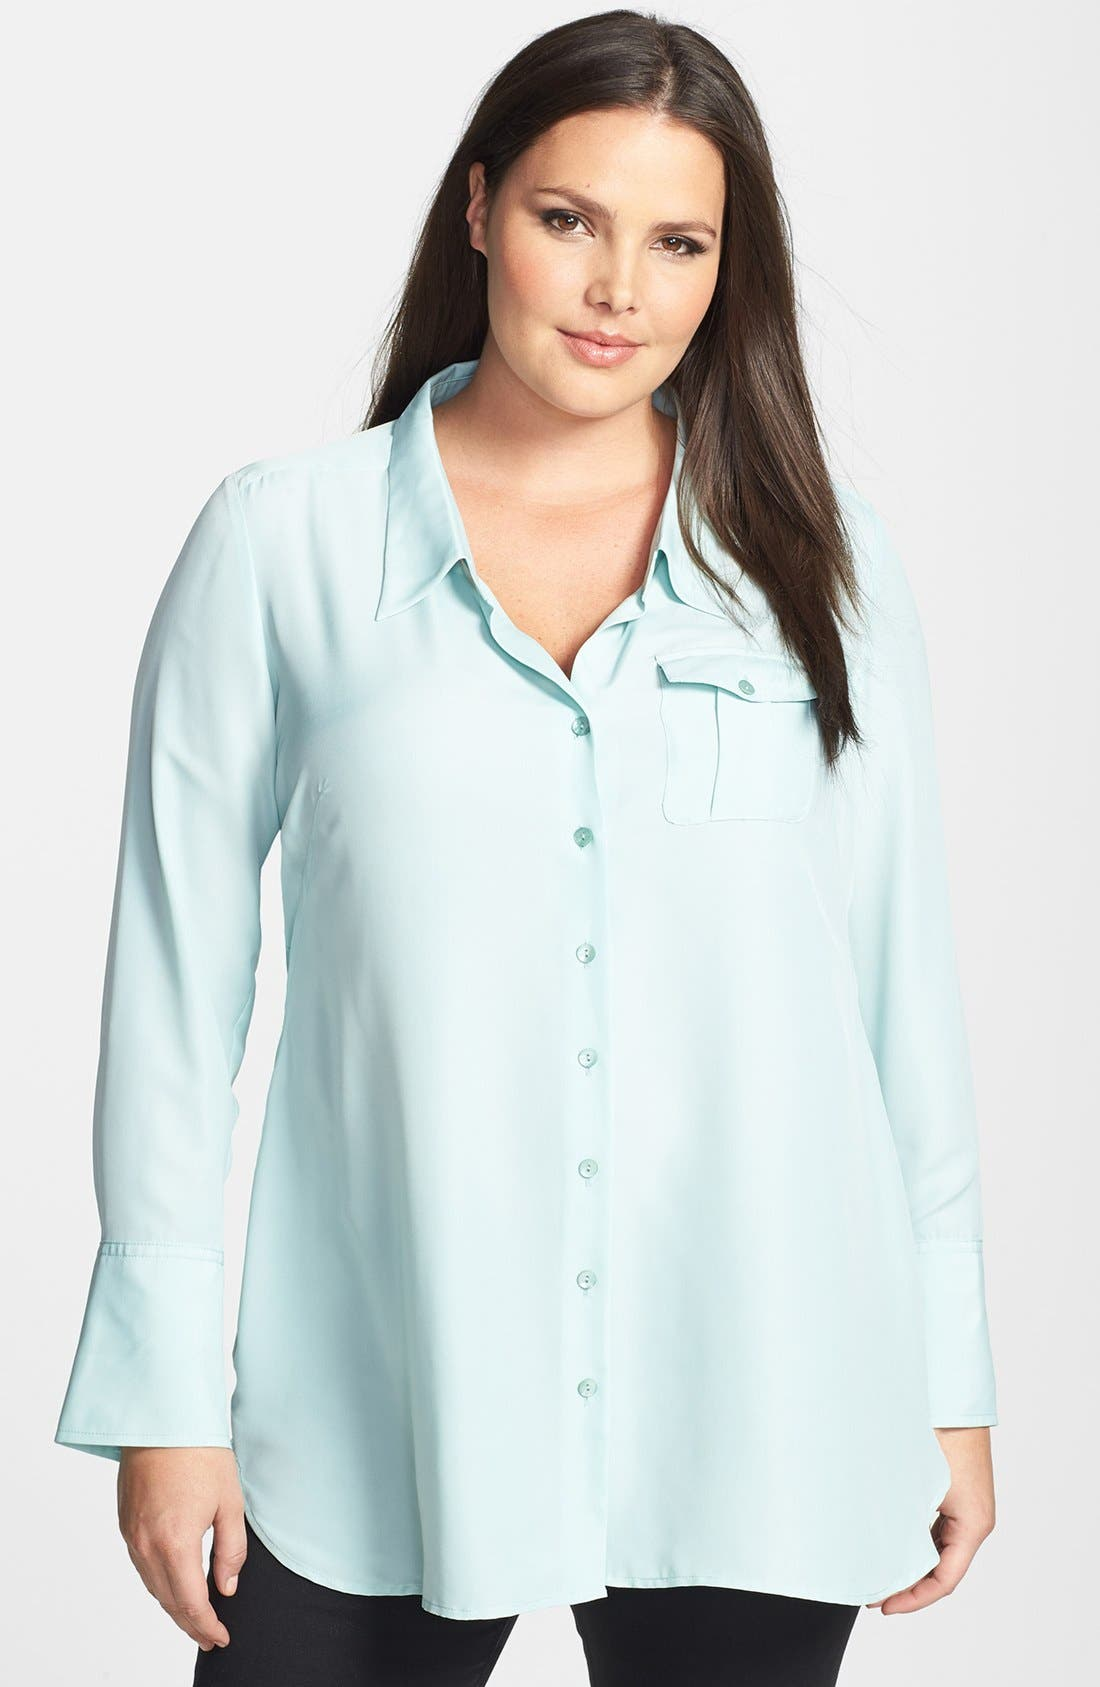 Alternate Image 1 Selected - NIC+ZOE 'Cool Mist' Shirt (Plus Size)